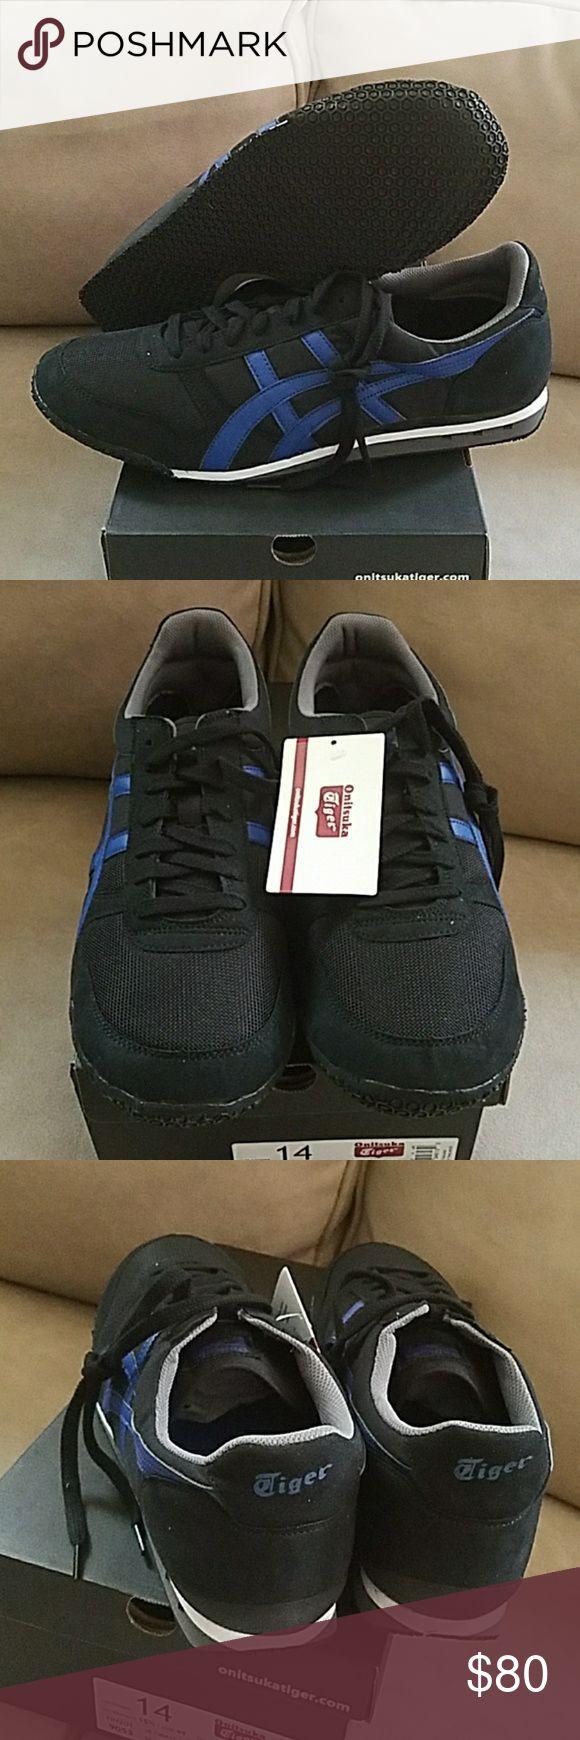 Onitsuka Tiger (Asics) Uktimate 81 Onitsuka Tiger (Asics) Uktimate 81  Size:  14 rare New in box Onitsuka Tiger by Asics Shoes Sneakers